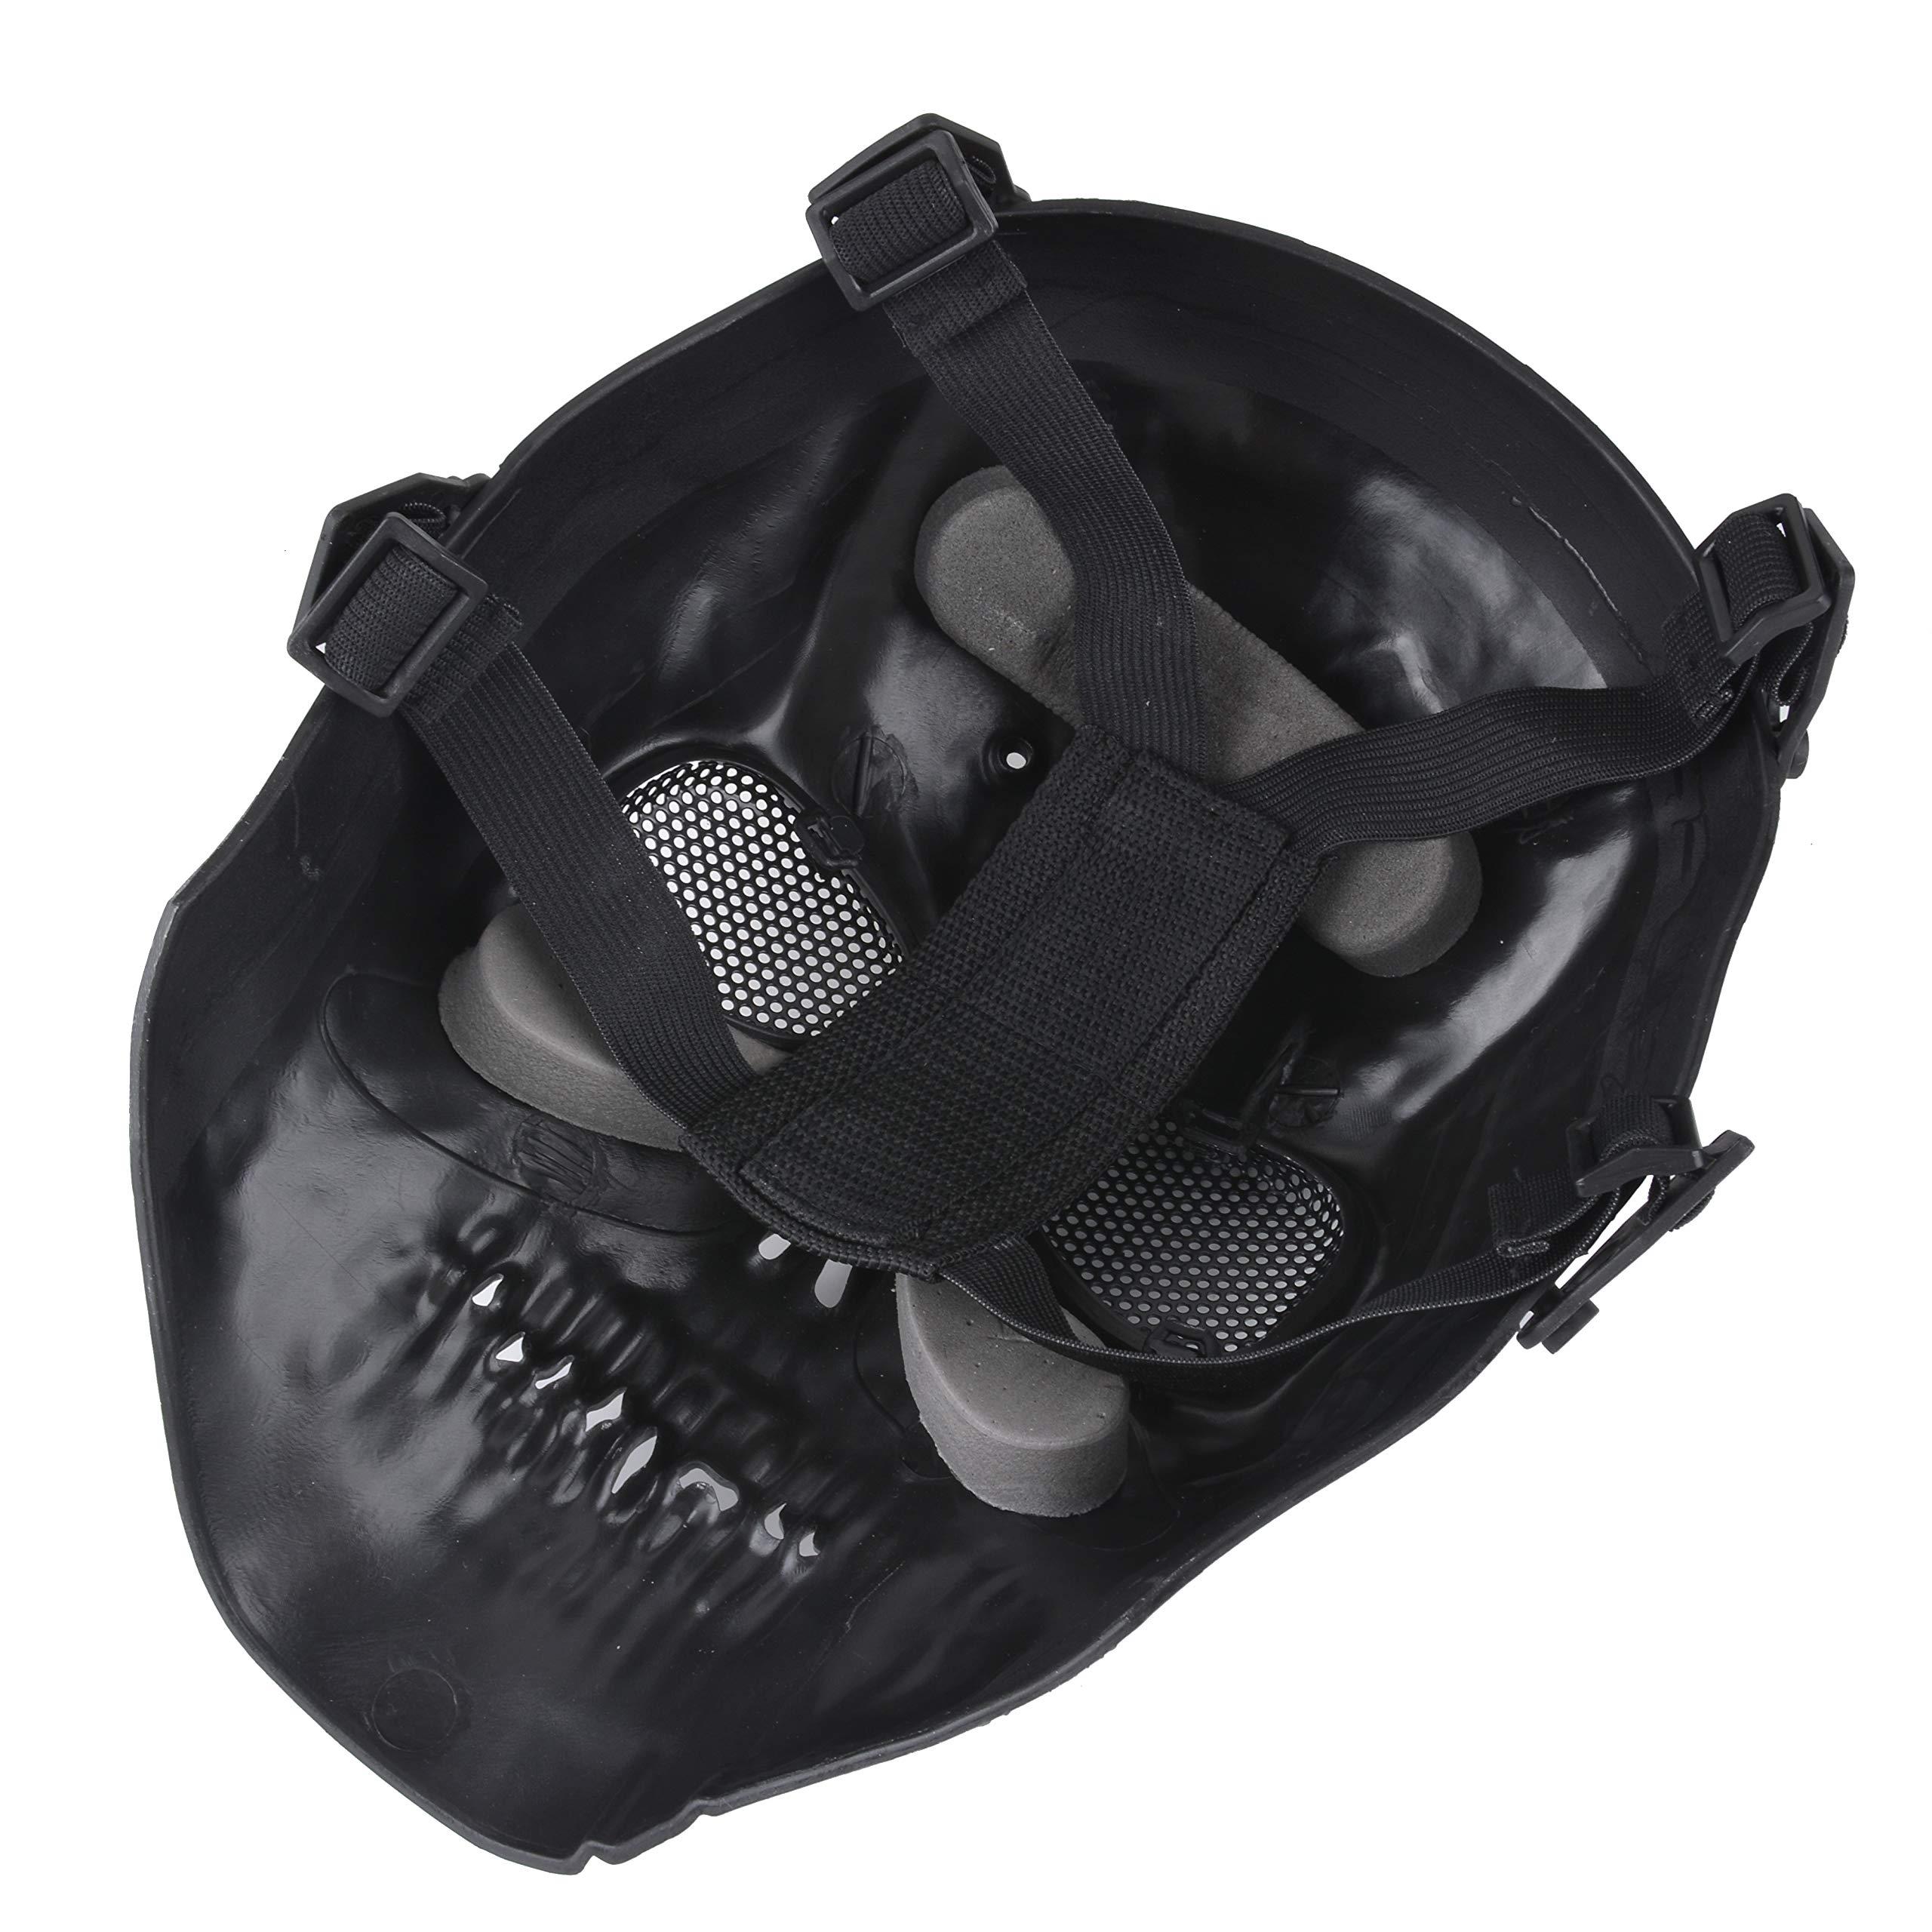 Fansport Halloween Costume Skull Skeleton Mask Full Length Hooded Cloak Adult Cape with Scary Halloween Mask